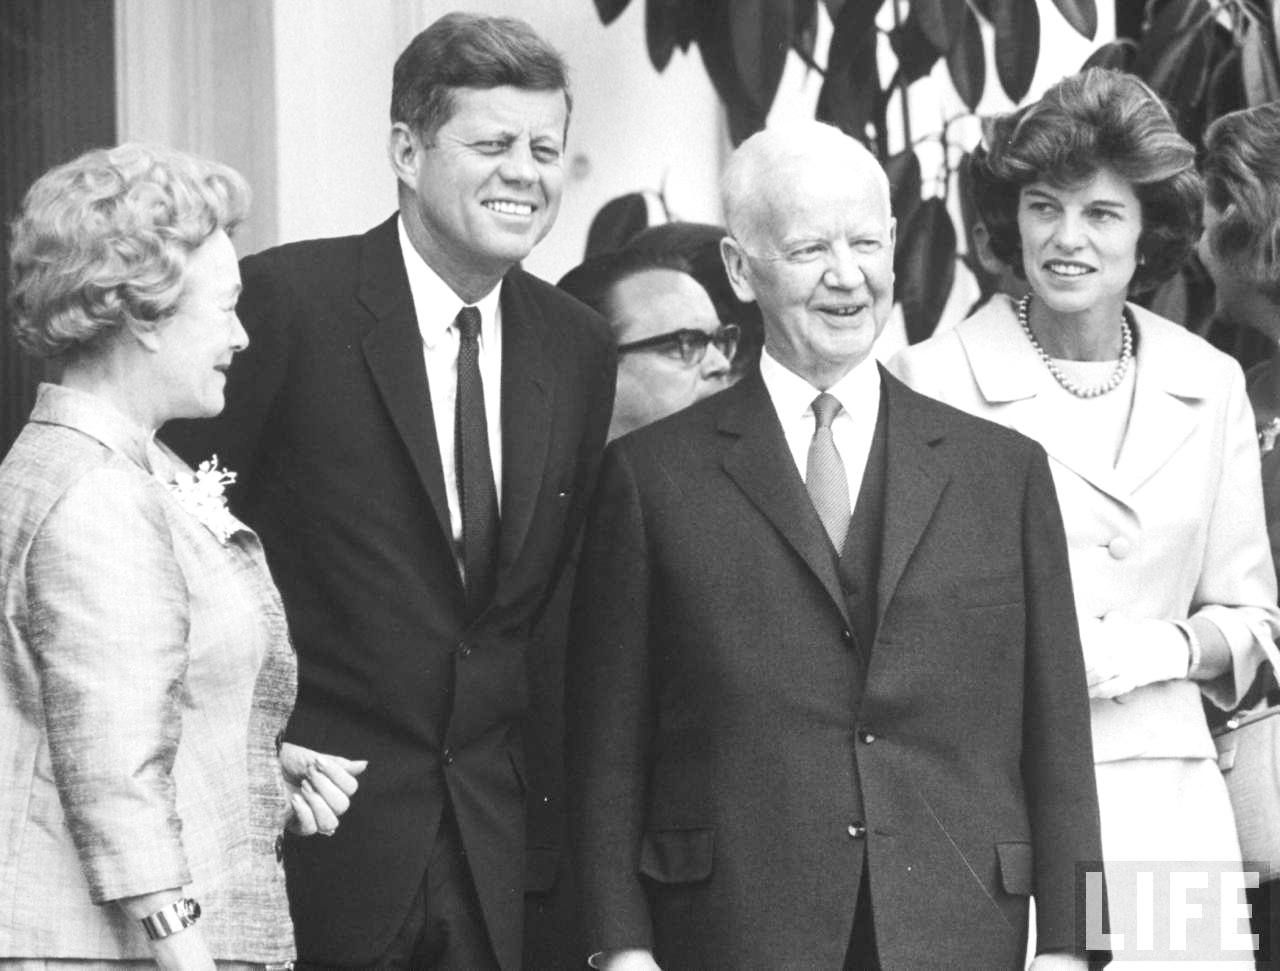 President of Germany Republic, Heinrich Lubke (2R) & wife entertaining President John F. Kennedys (2L) and Mrs. Sargent R. Shriver (R).Bonn, Germany June 1963 ♡❀♡✿♡❁♡✾♡✽♡❃♡❀♡ http://en.wikipedia.org/wiki/John_F._Kennedy http://www.jfklibrary.org/Asset-Viewer/Archives/JFKPOF-117-015.aspx http://en.wikipedia.org/wiki/Ich_bin_ein_Berliner http://www.nps.gov/nr/travel/presidents/john_f_kennedy_birthplace.html